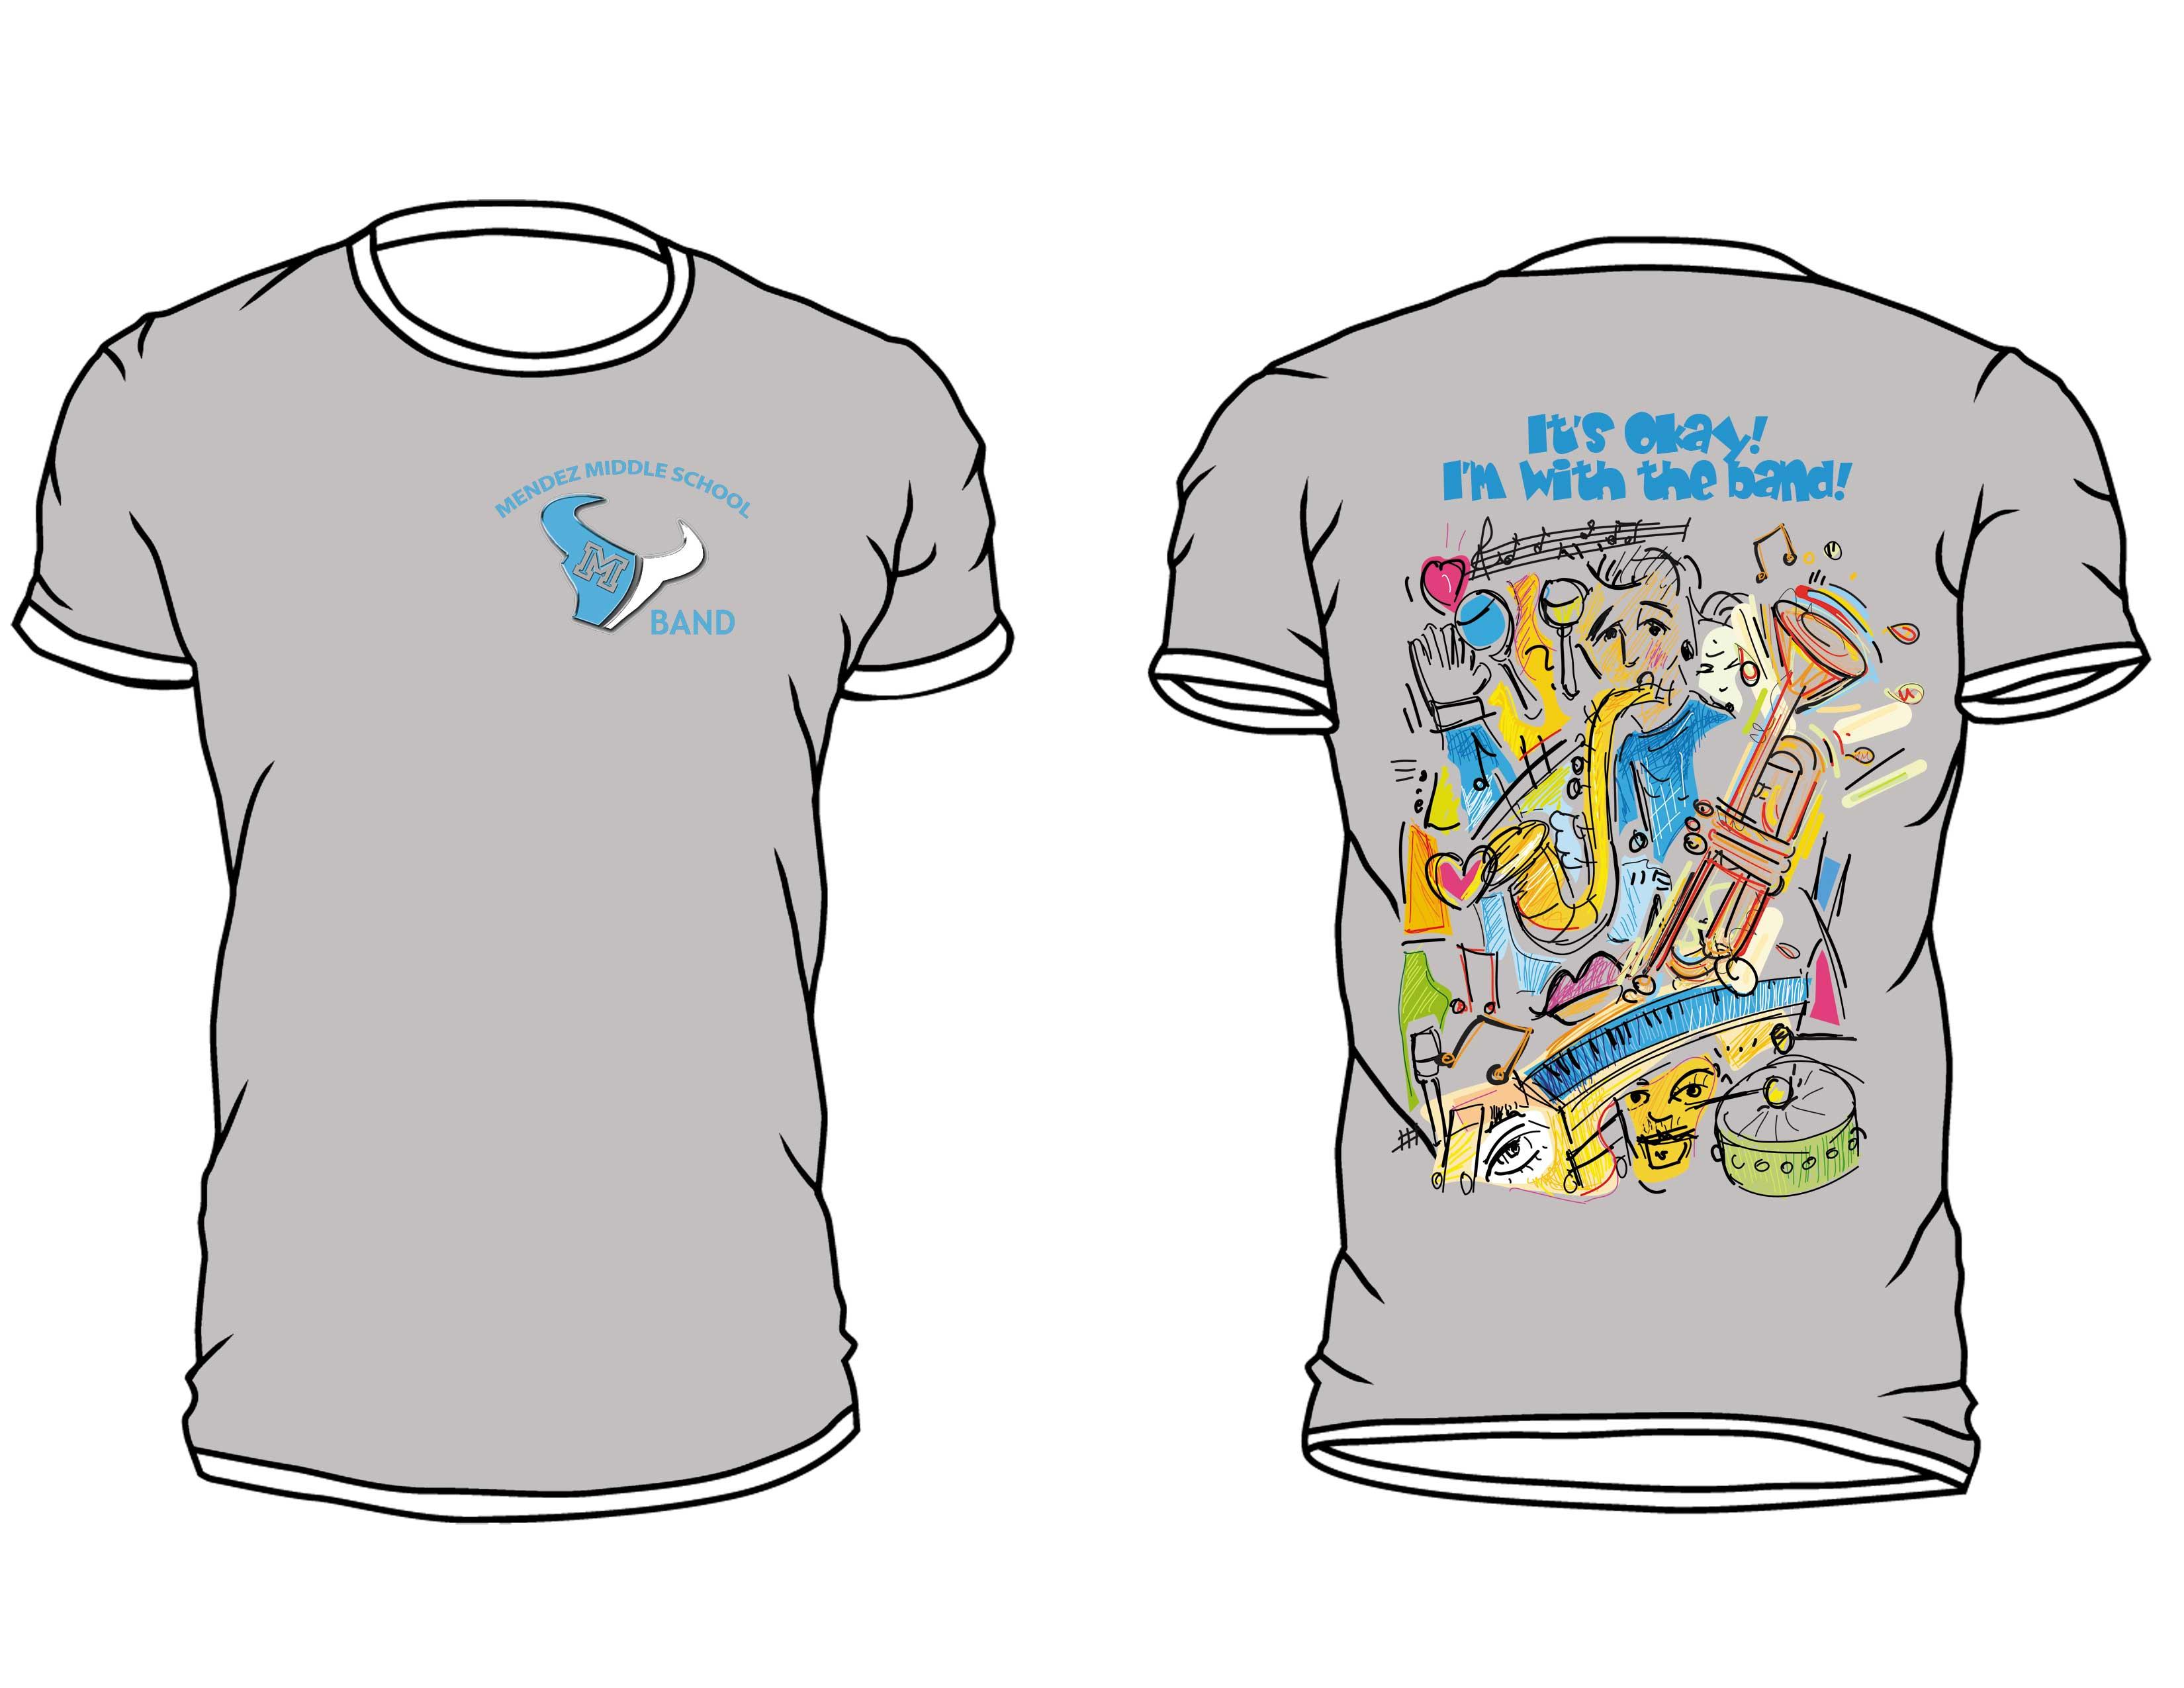 T Shirt Design Ideas For Schools   School Spirit Wear Ideas T Shirt Design  Ideas Download